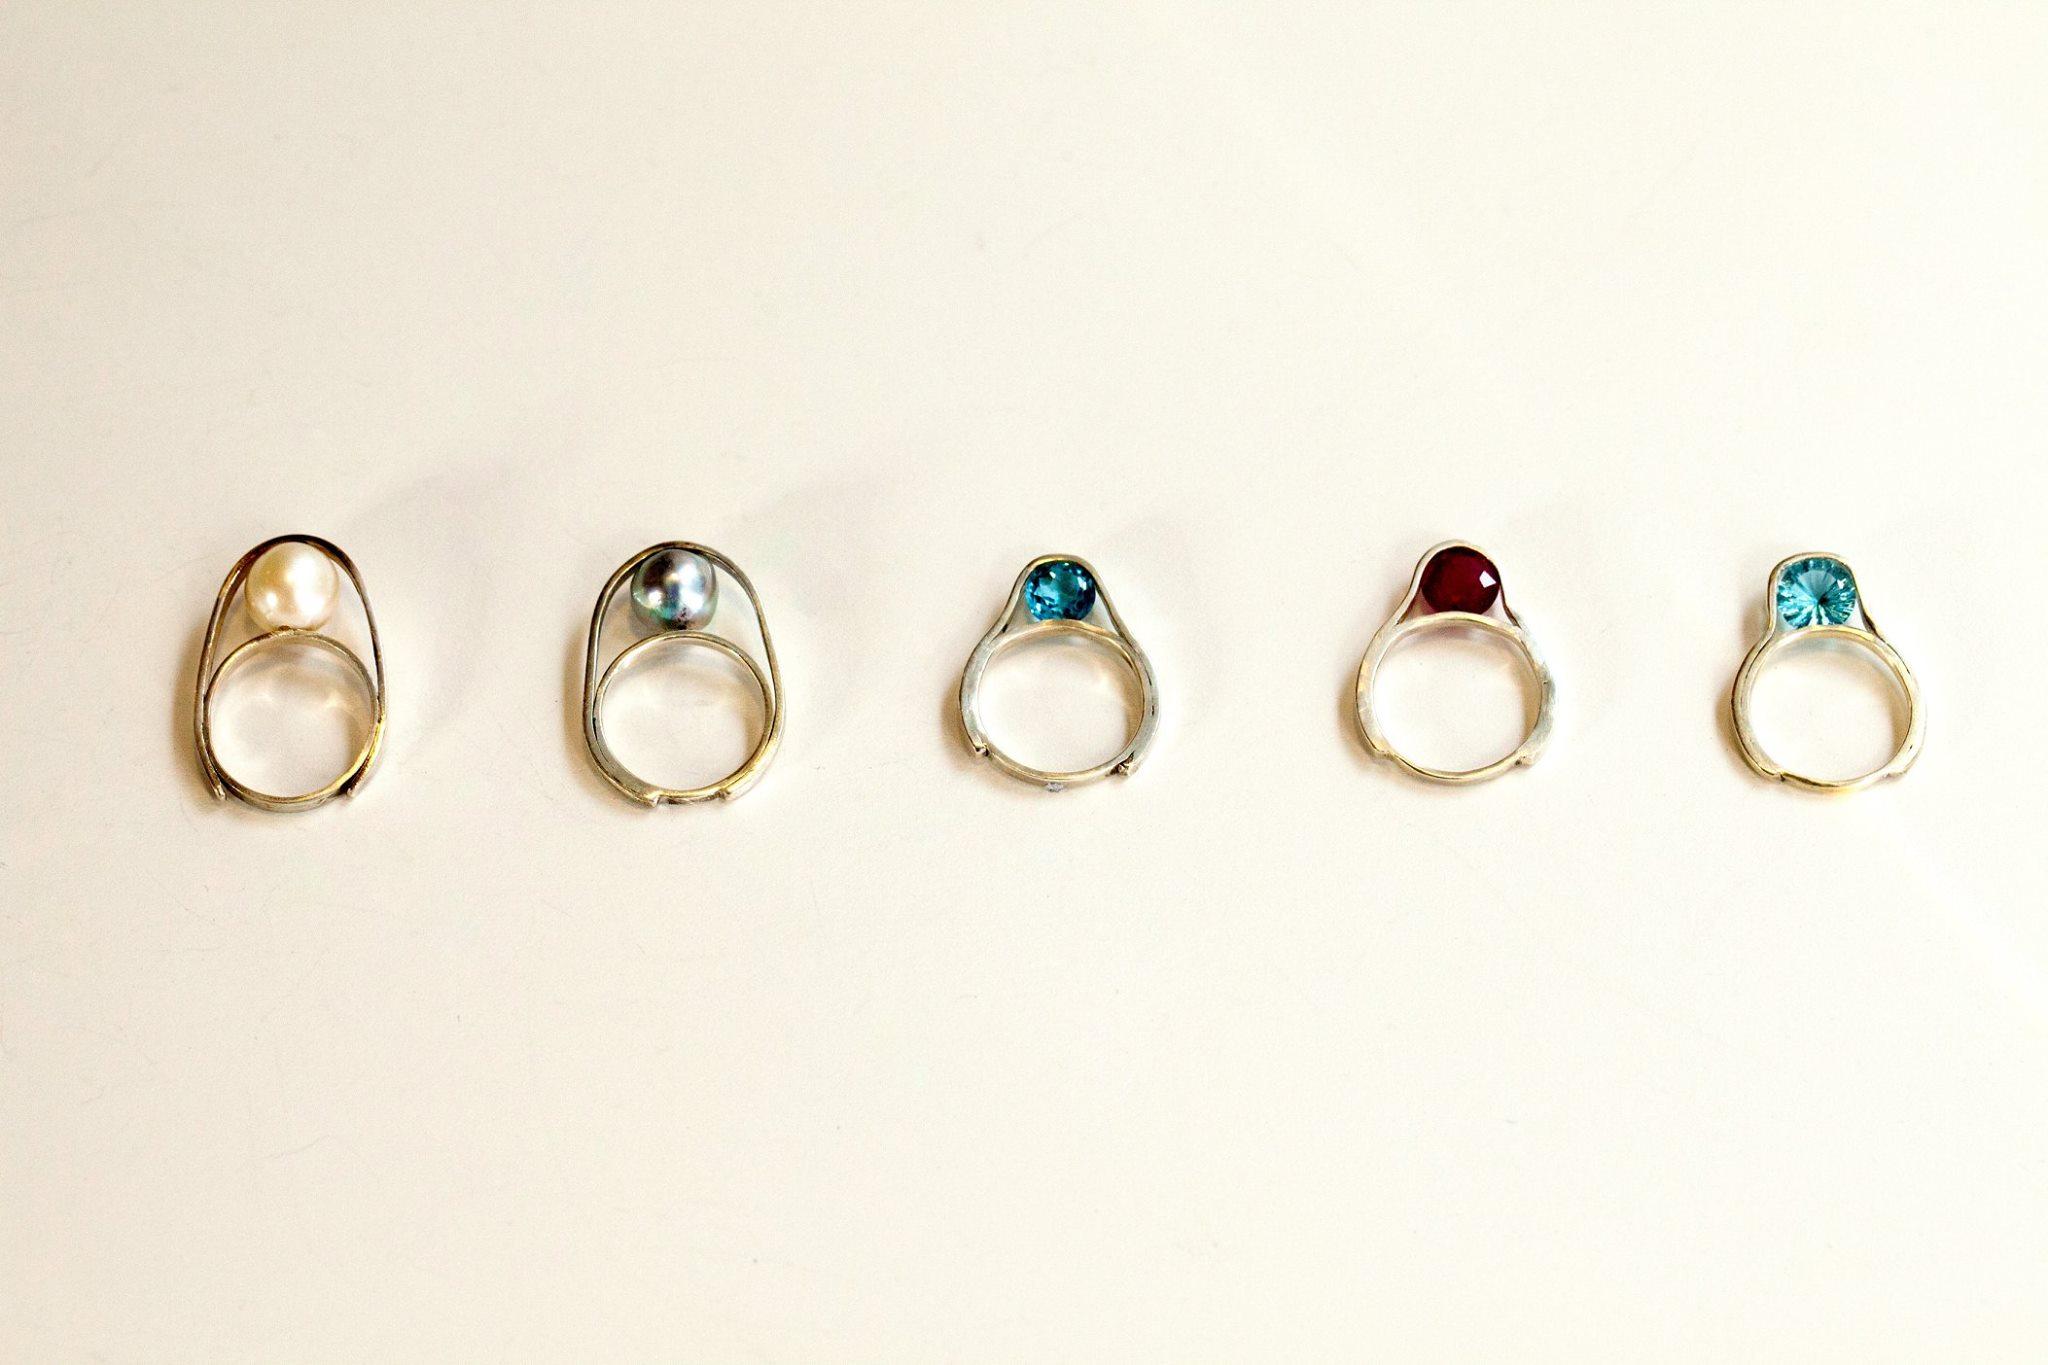 O rings by Mariko Tsuchiyama x SOIL